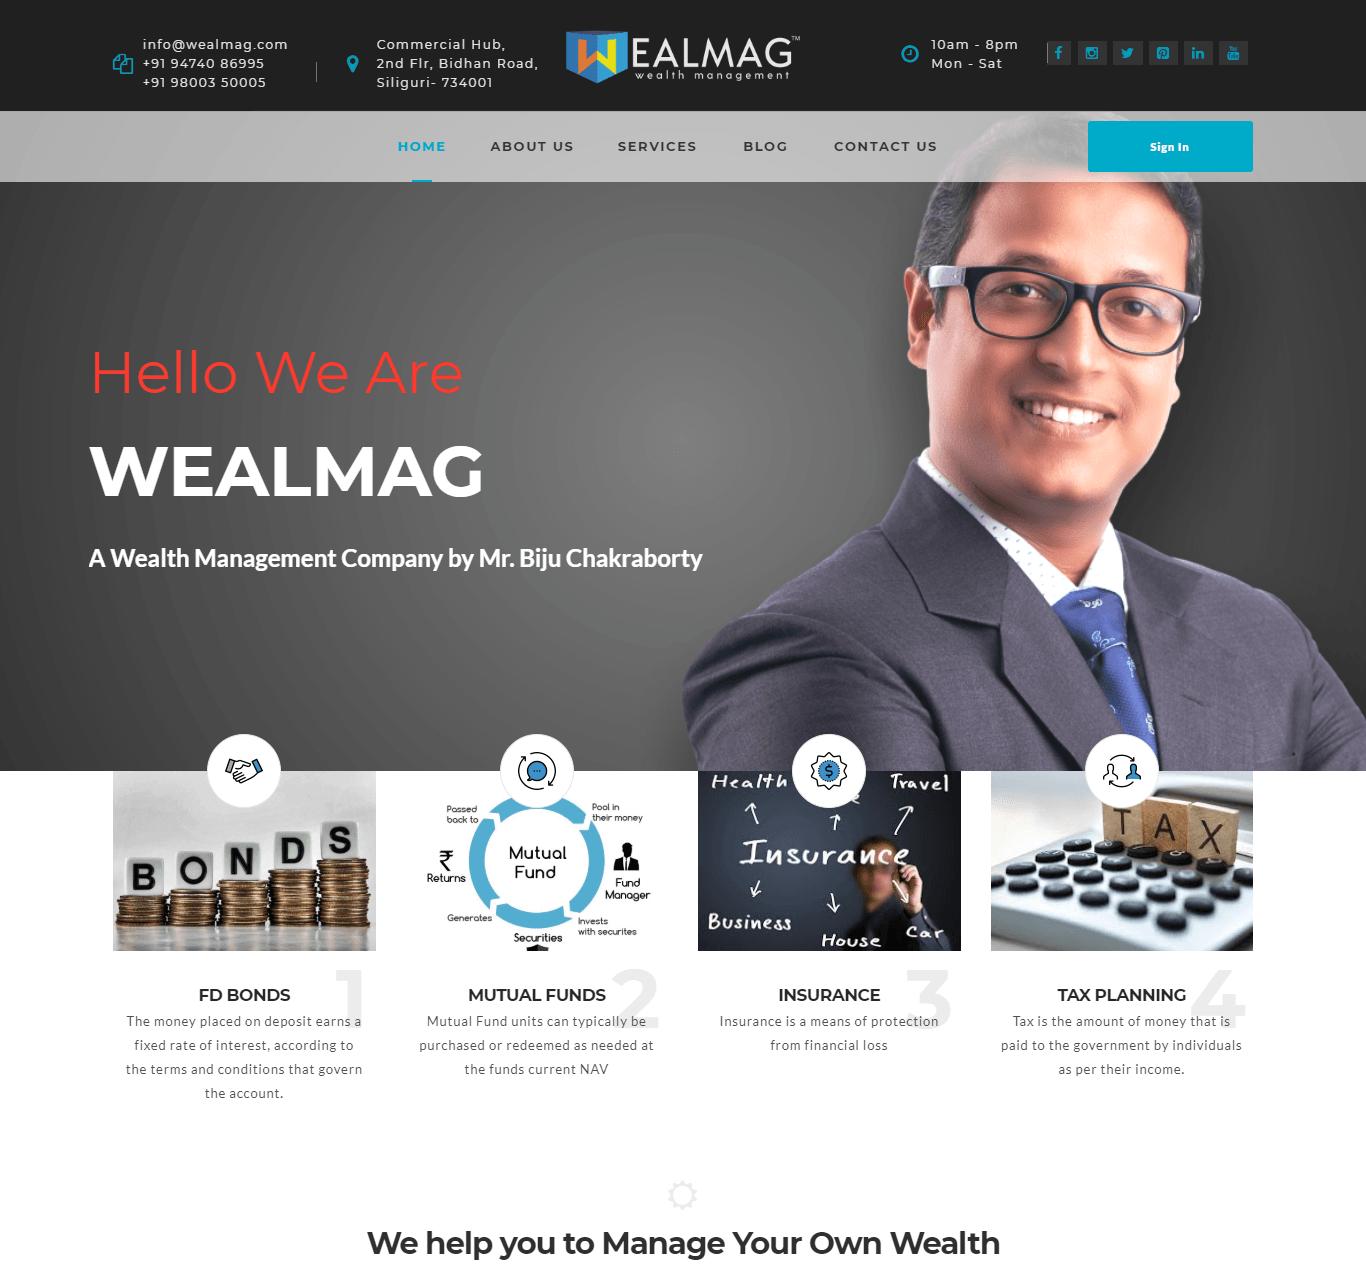 image8 - Website Building